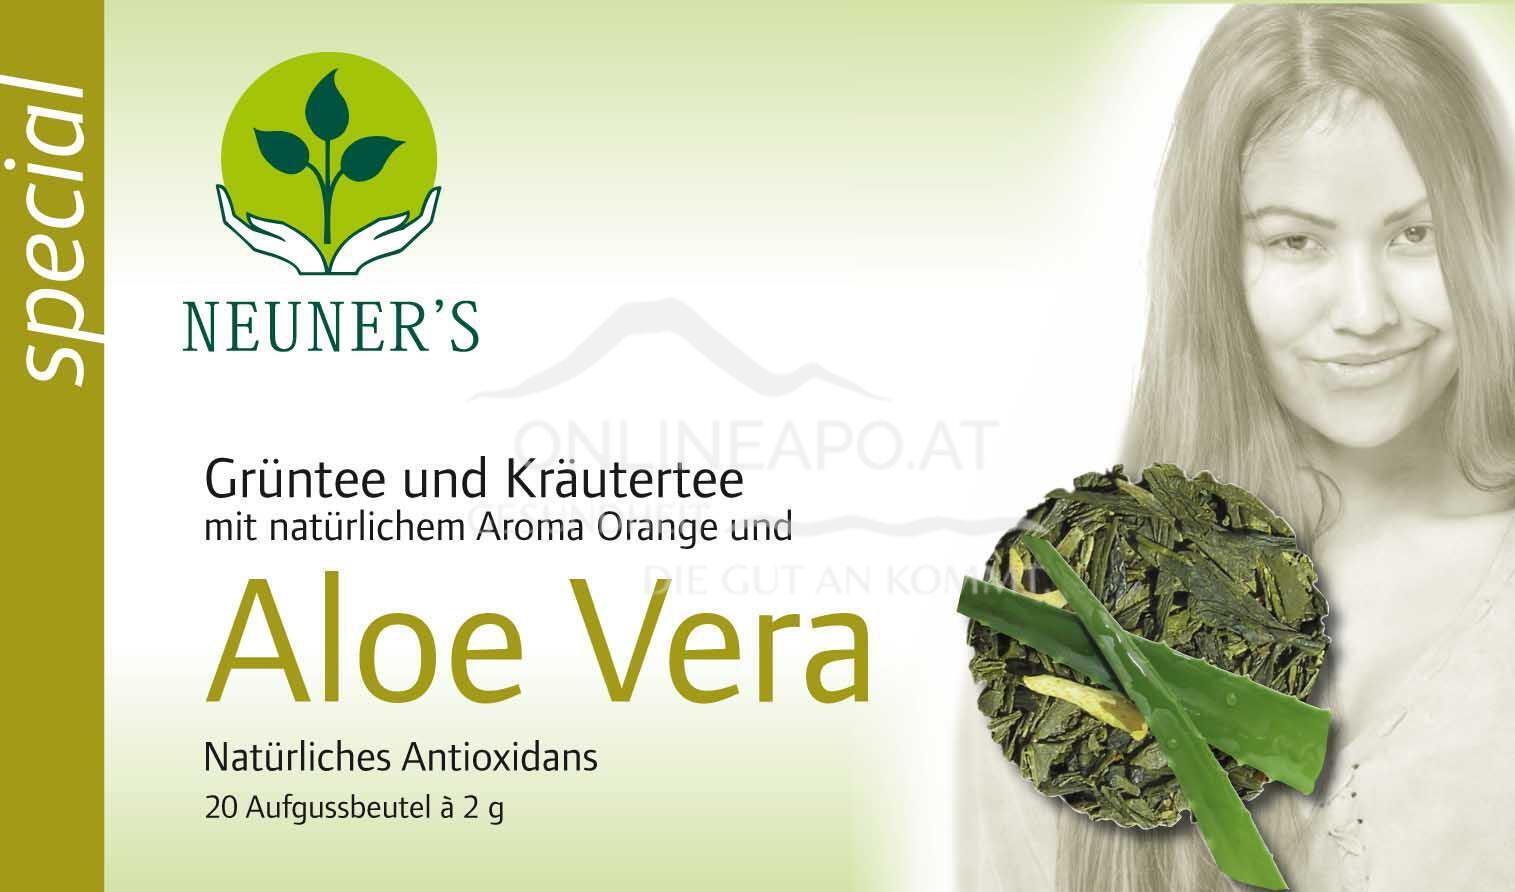 Neuner''sGrünteemischung mit Aloe Vera